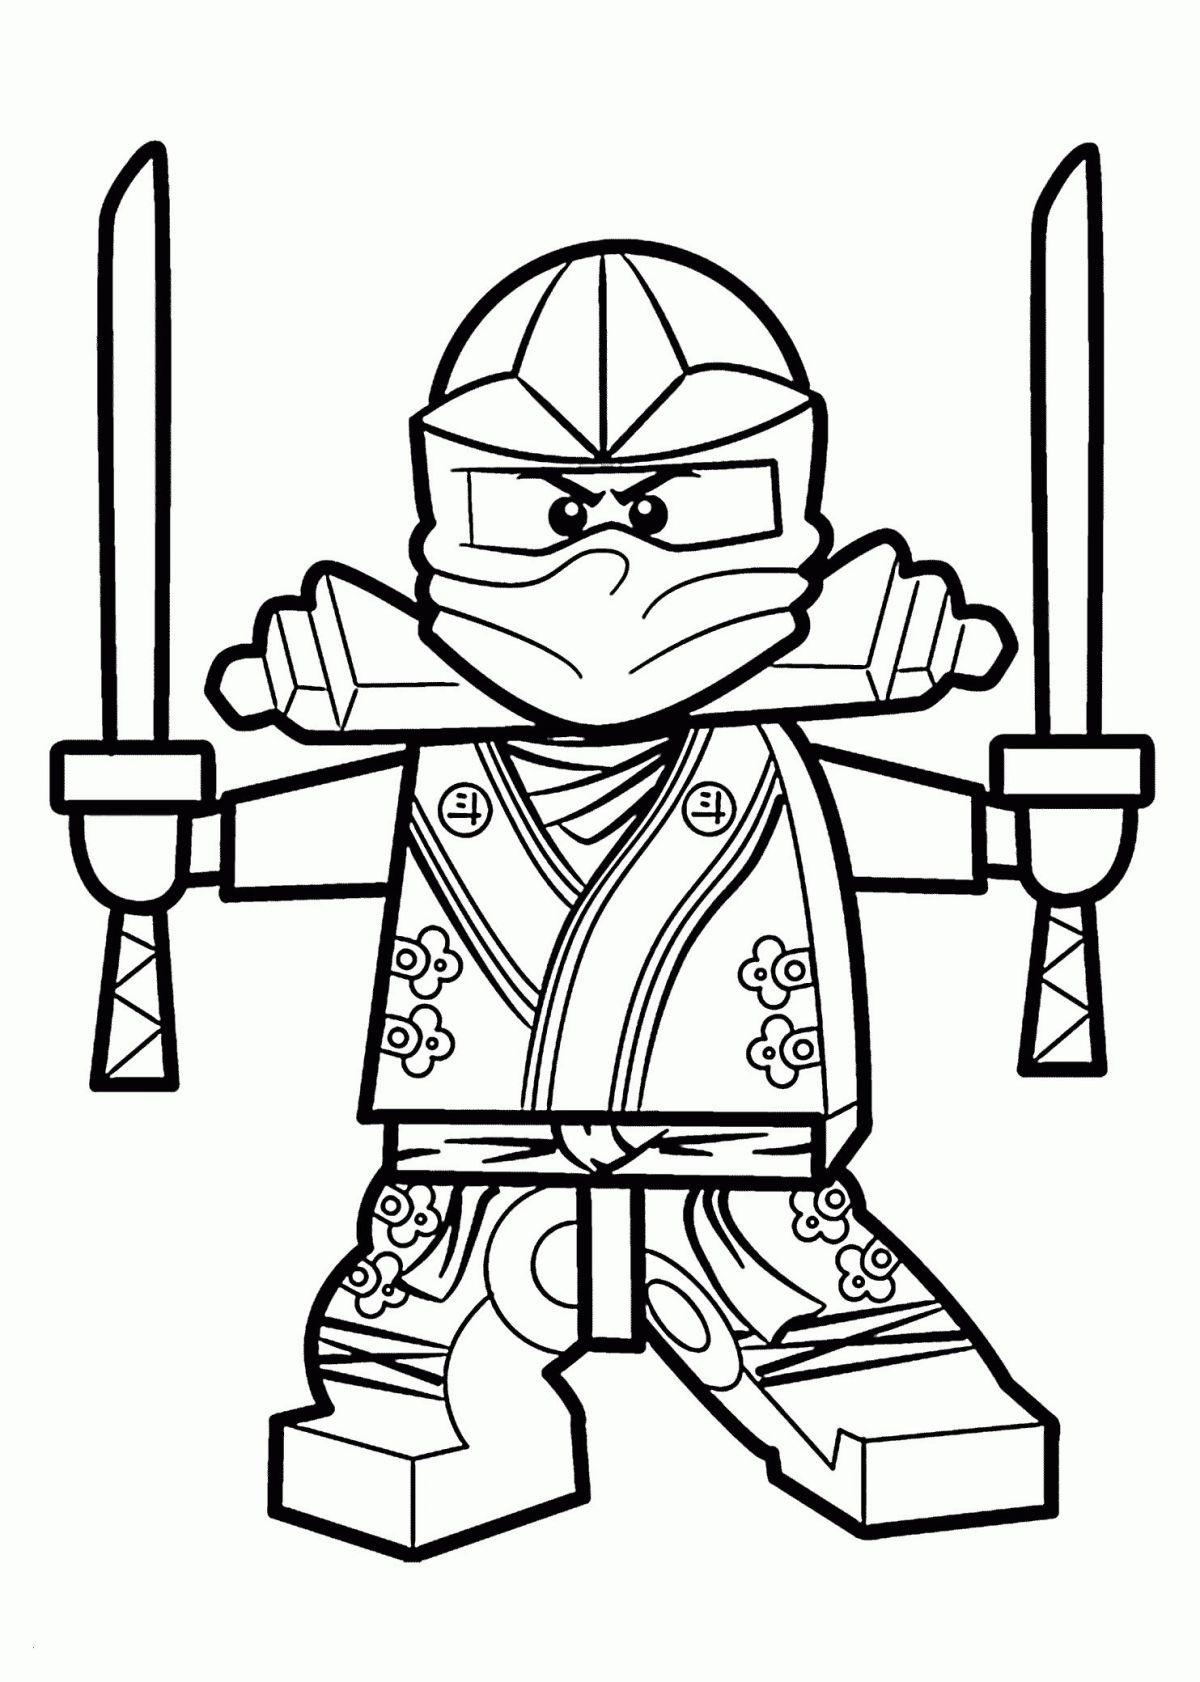 Ninjago Bilder Zum Ausdrucken Kostenlos Inspirierend 40 Ninjago Ausmalbilder Goldener Ninja Scoredatscore Elegant Ninjago Sammlung